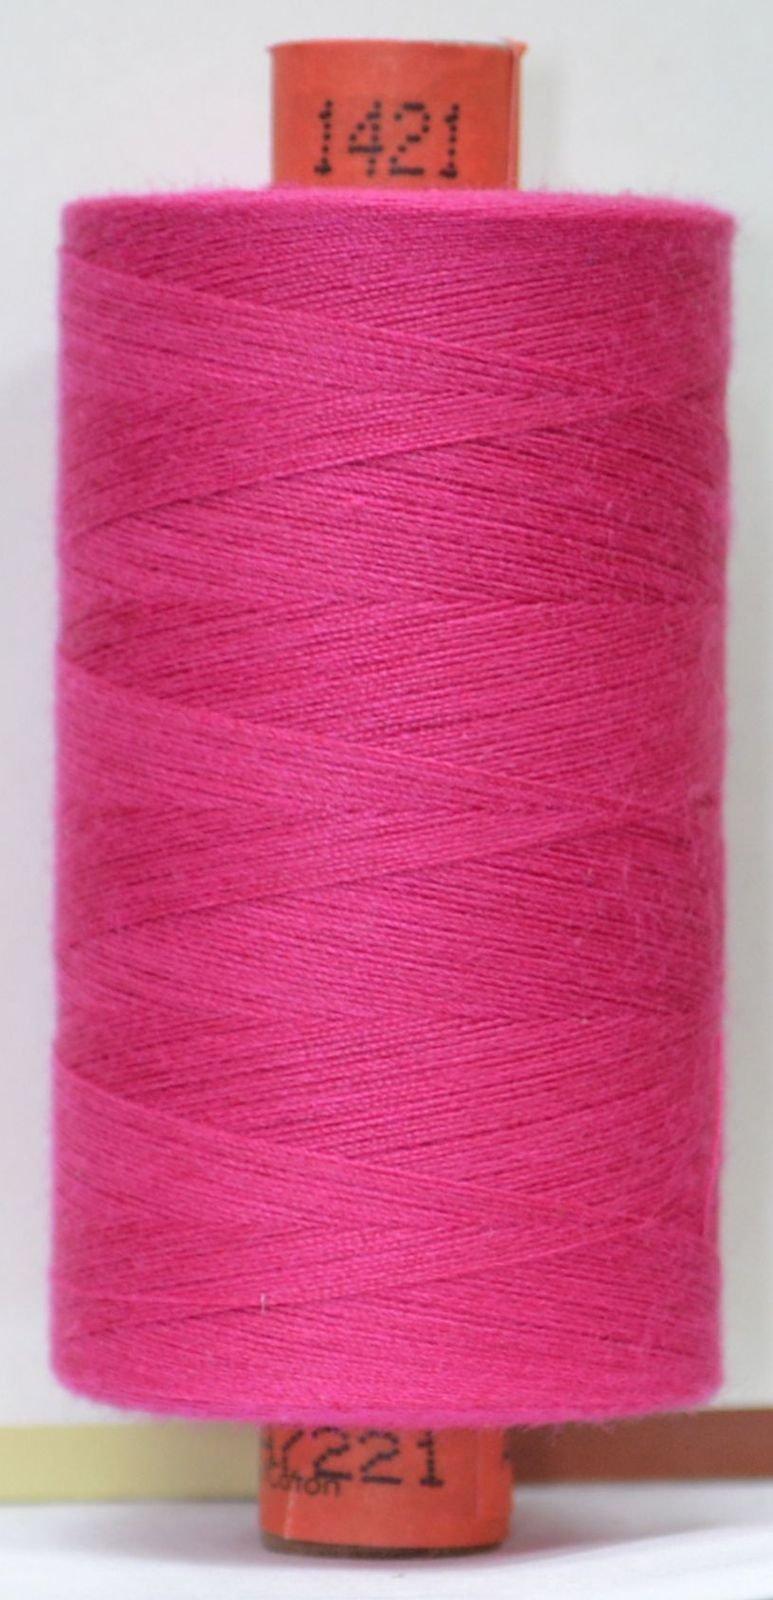 Rasant Thread Polyester Cotton 1000M - 1421 (old colour 2300)